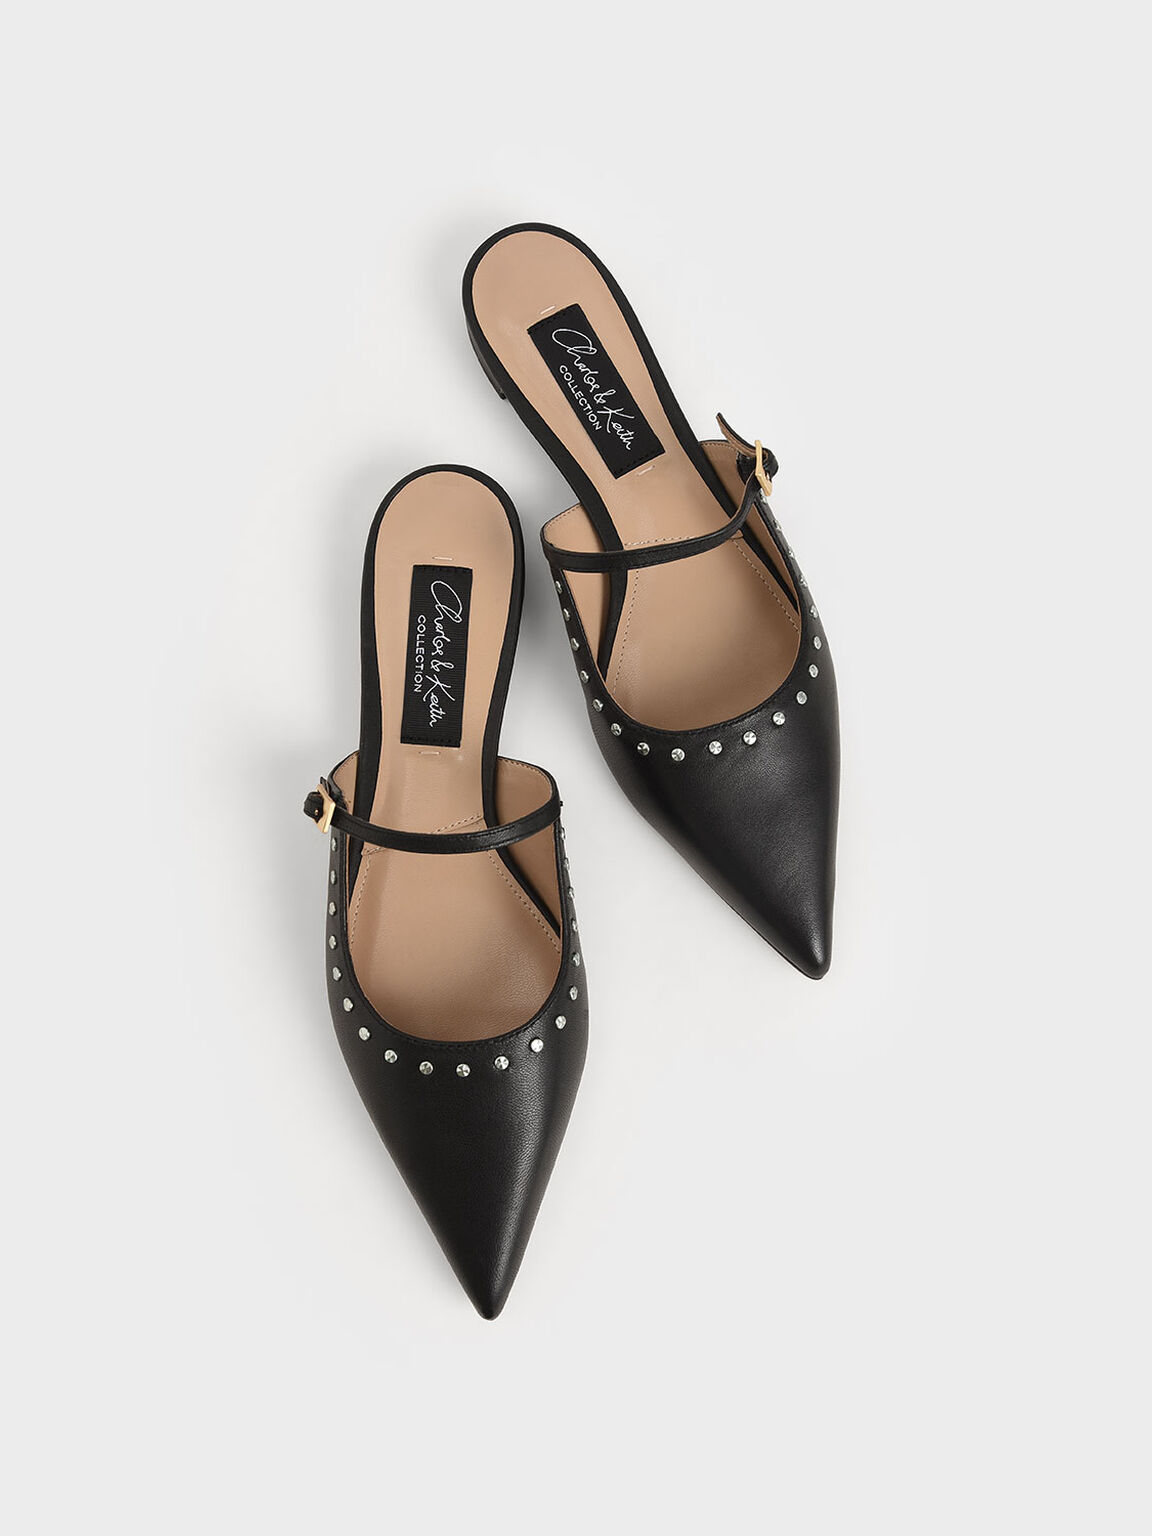 Studded Leather Mules, Black, hi-res